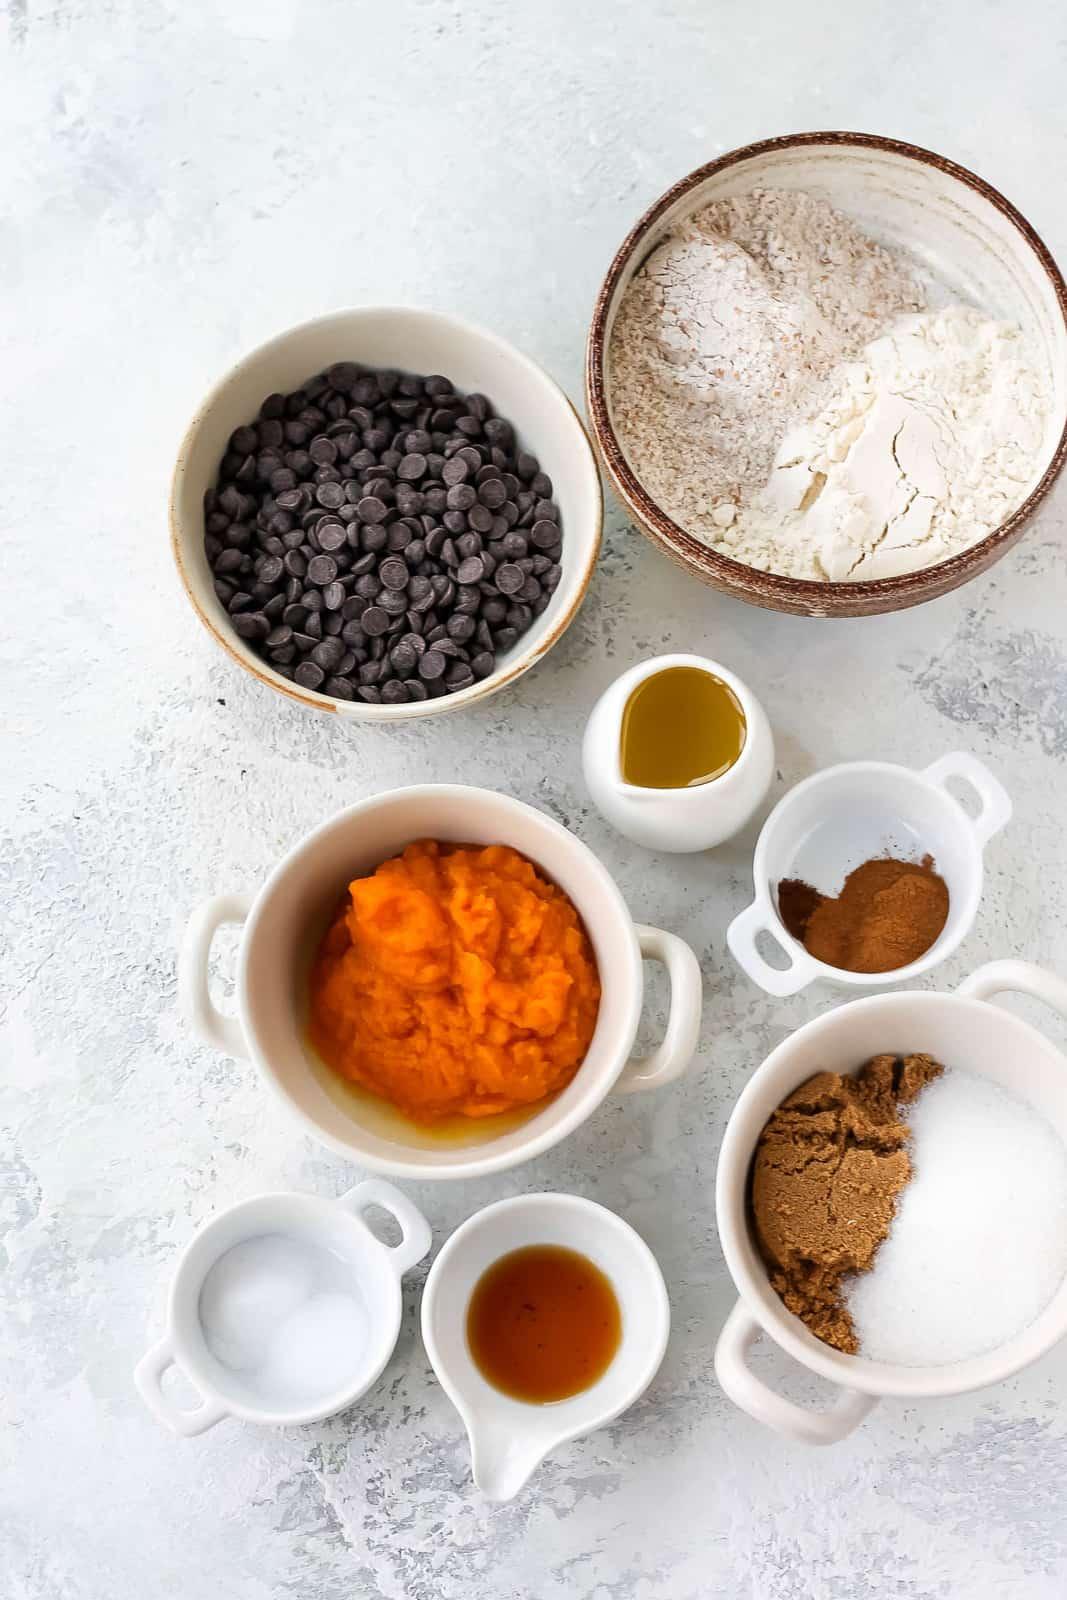 pumpkin purée, chocolate chips, flour, spices, sugar, vanilla, and salt on a grey background